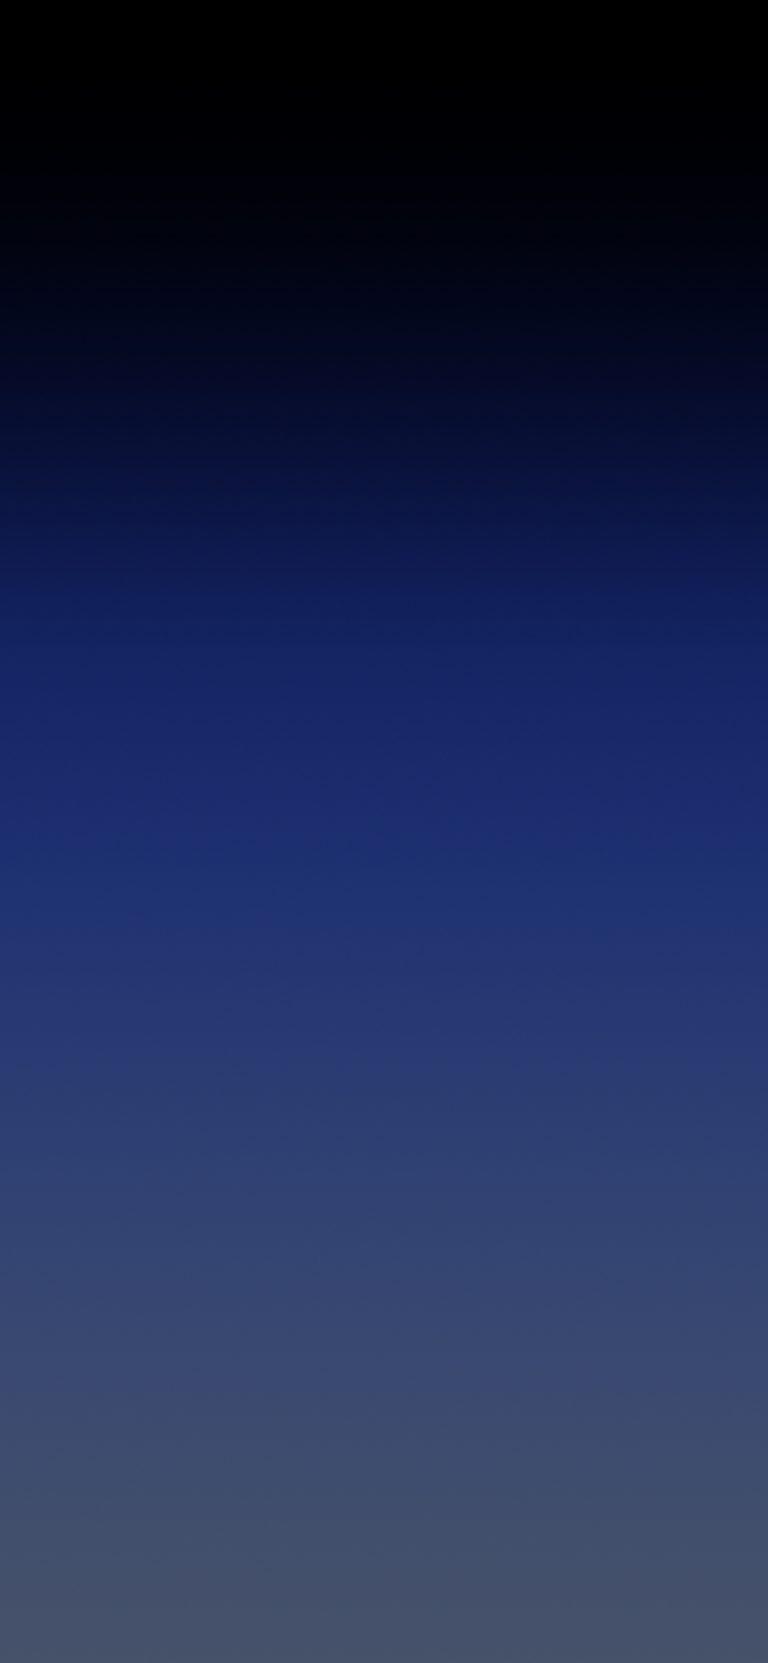 Minimal Gradient Wallpapers To Hide The Iphone X Notch In 2020 Dark Blue Wallpaper Plain Wallpaper Iphone Black Wallpaper Iphone